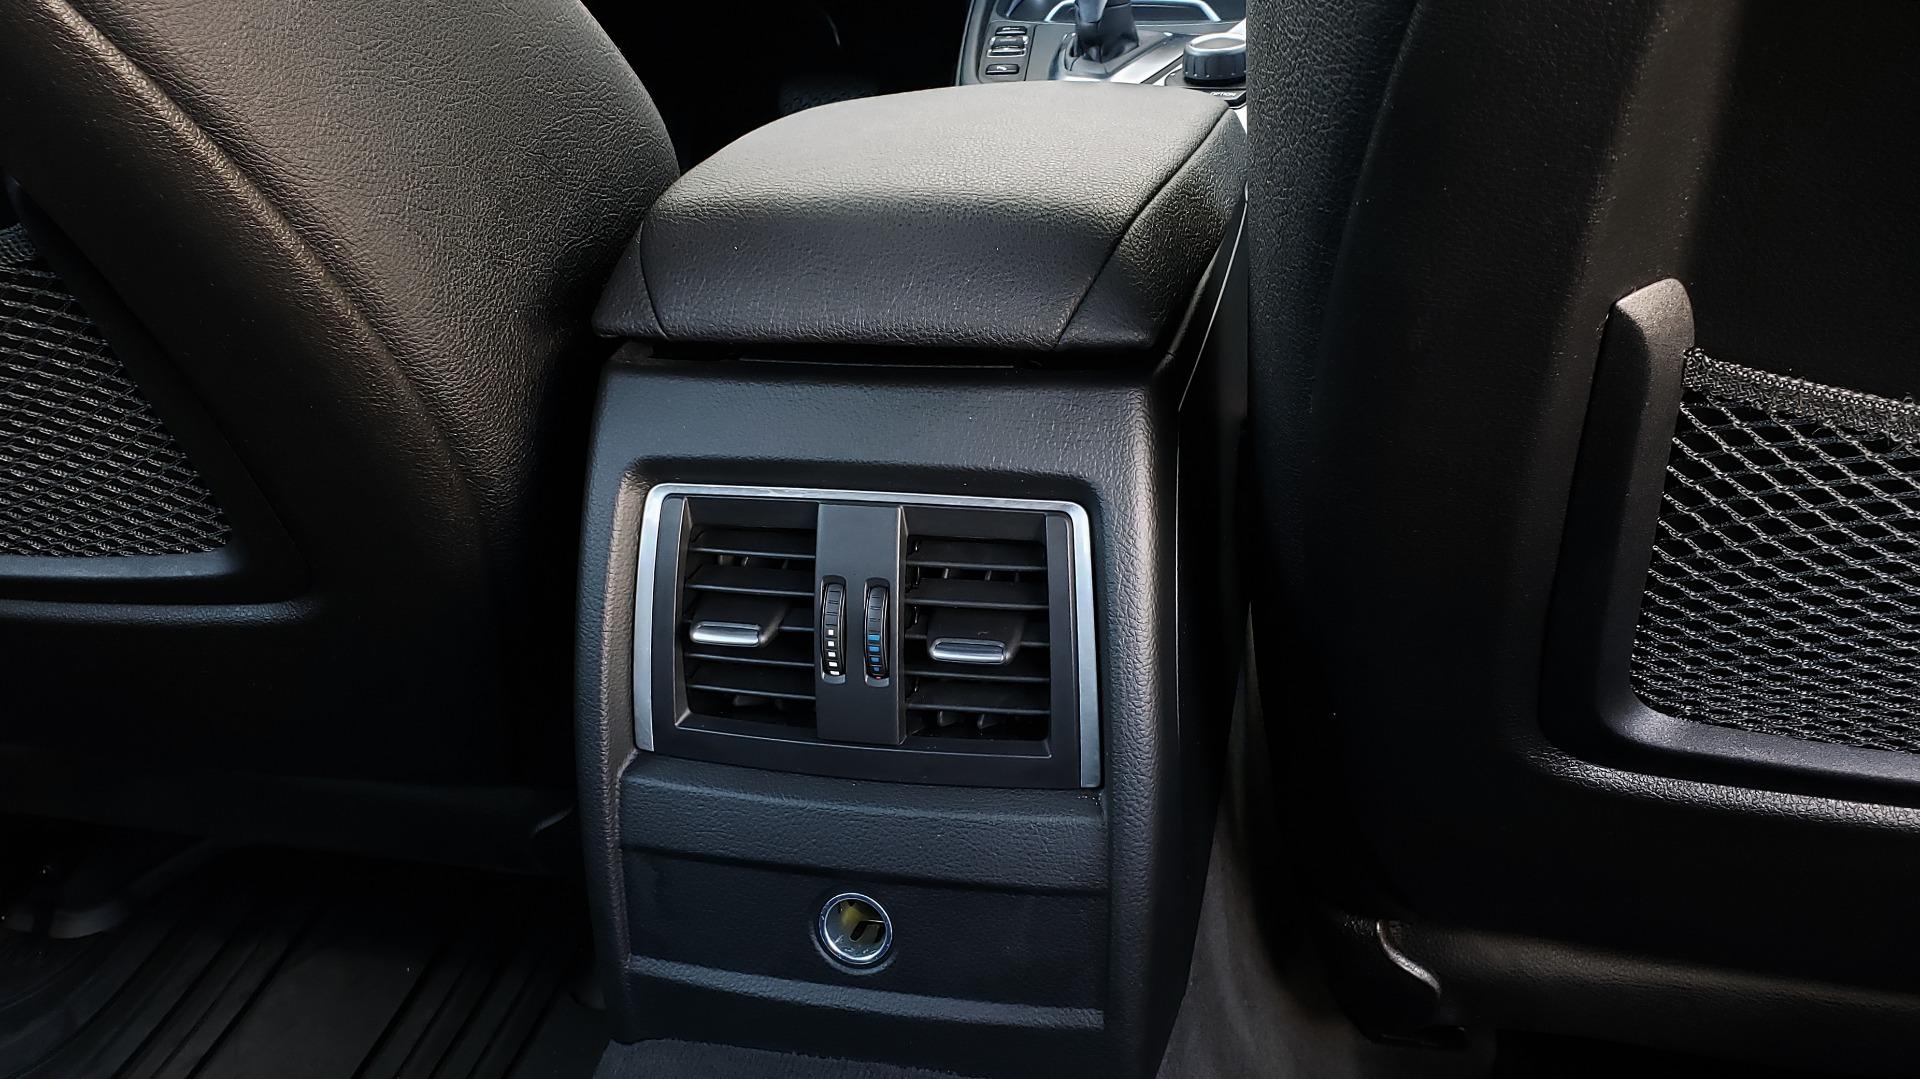 Used 2017 BMW 3 SERIES 330I SPORT SEDAN / DRVR ASST PKG / SUNROOF / REARVIEW for sale Sold at Formula Imports in Charlotte NC 28227 74